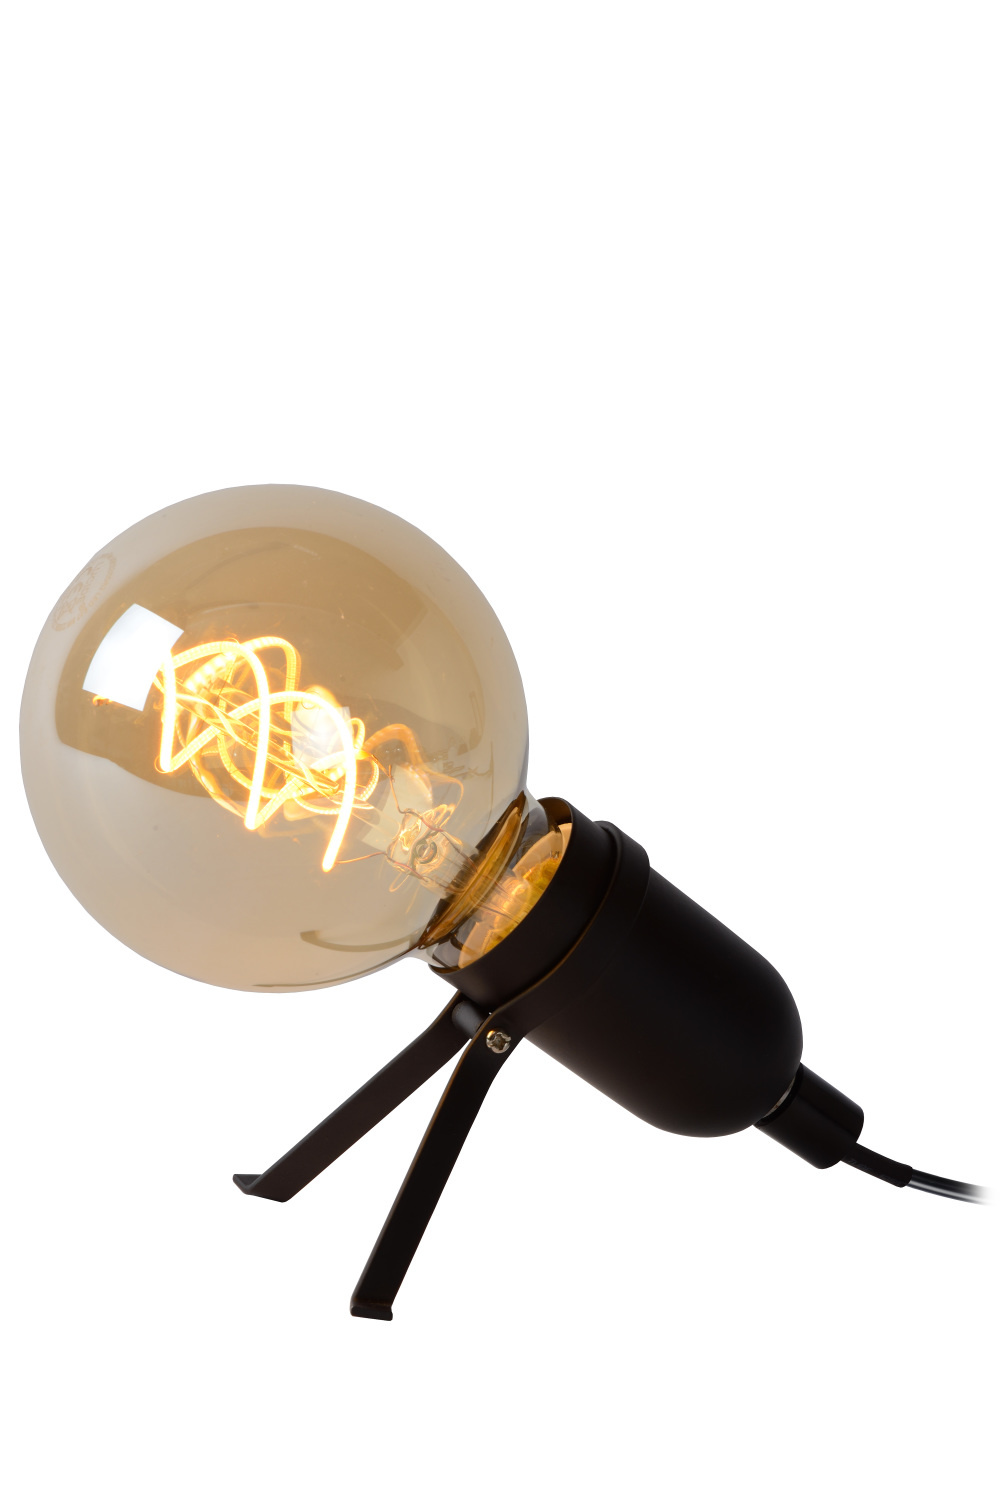 Lucide PUKKI Tafellamp-Zwart-LED-1xE27-5W-2200K-Metaal